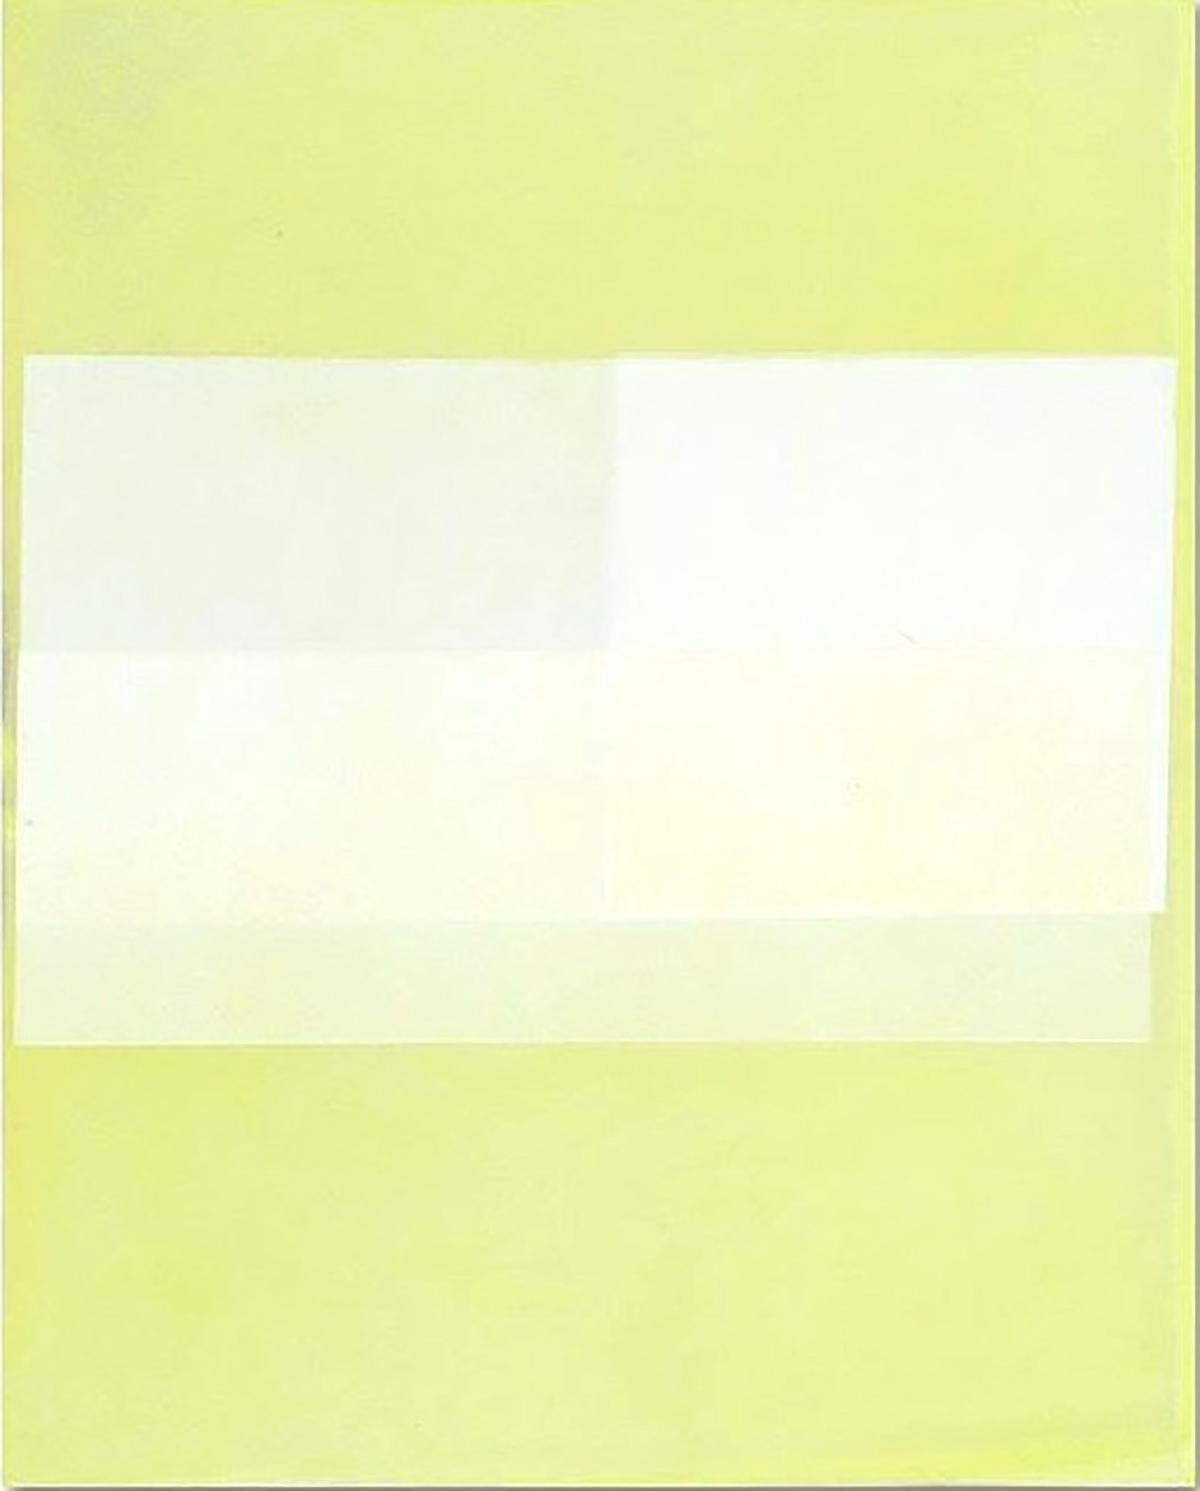 Jeffrey Cortland Jones, 'Souvenir', enamel on acrylic panel